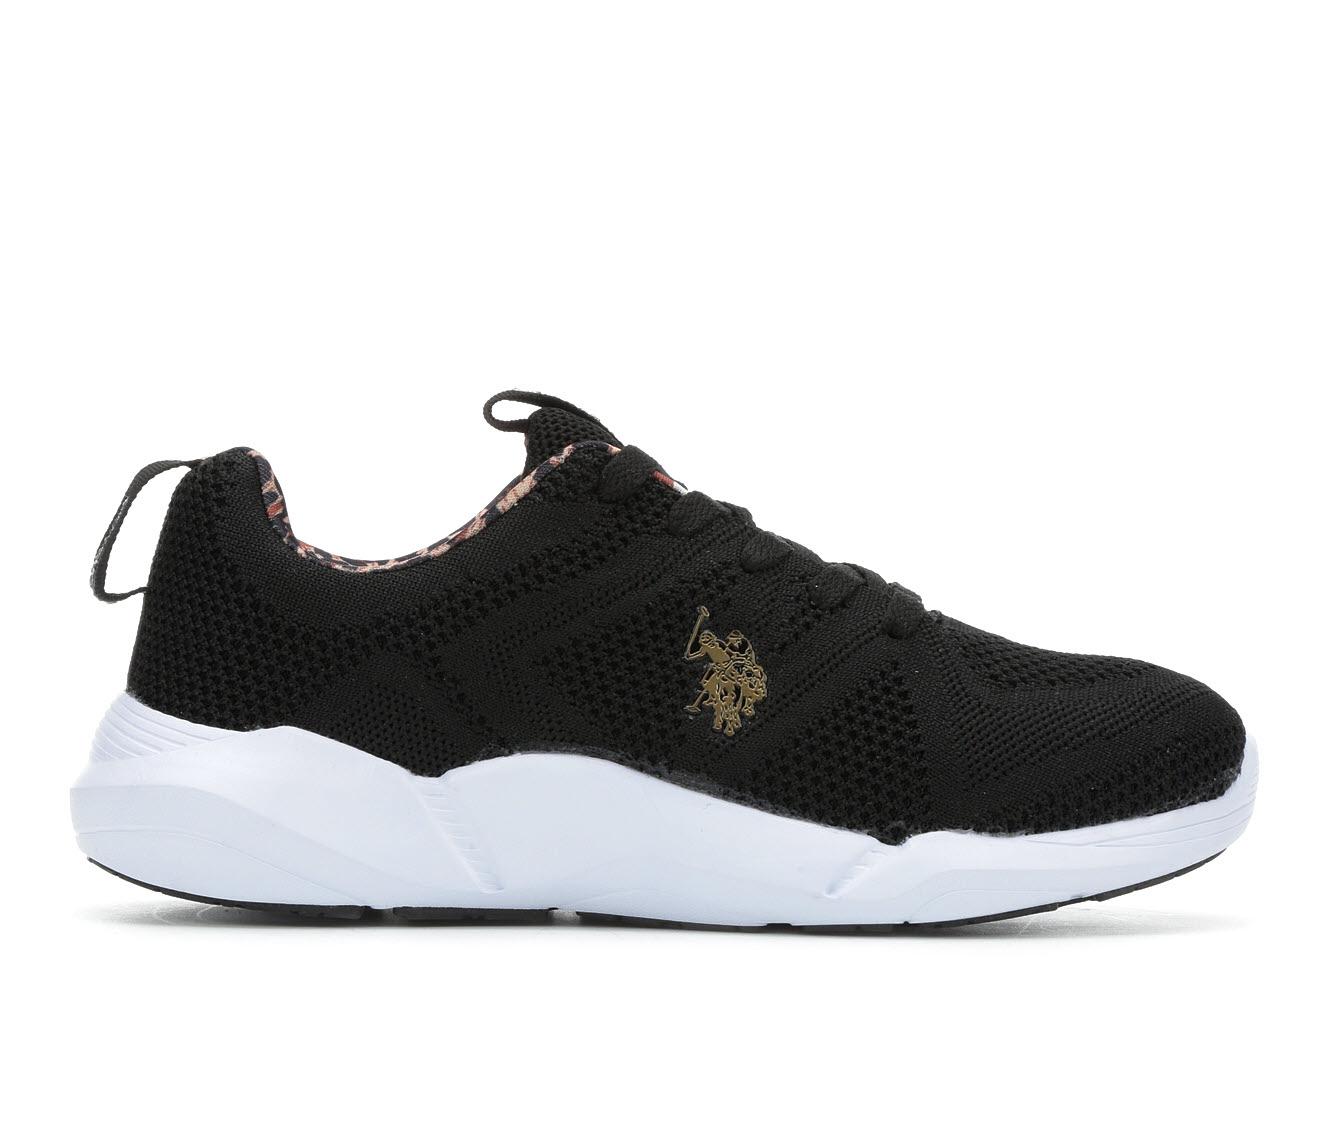 US Polo Assn Lavina Women's Athletic Shoe (Black)